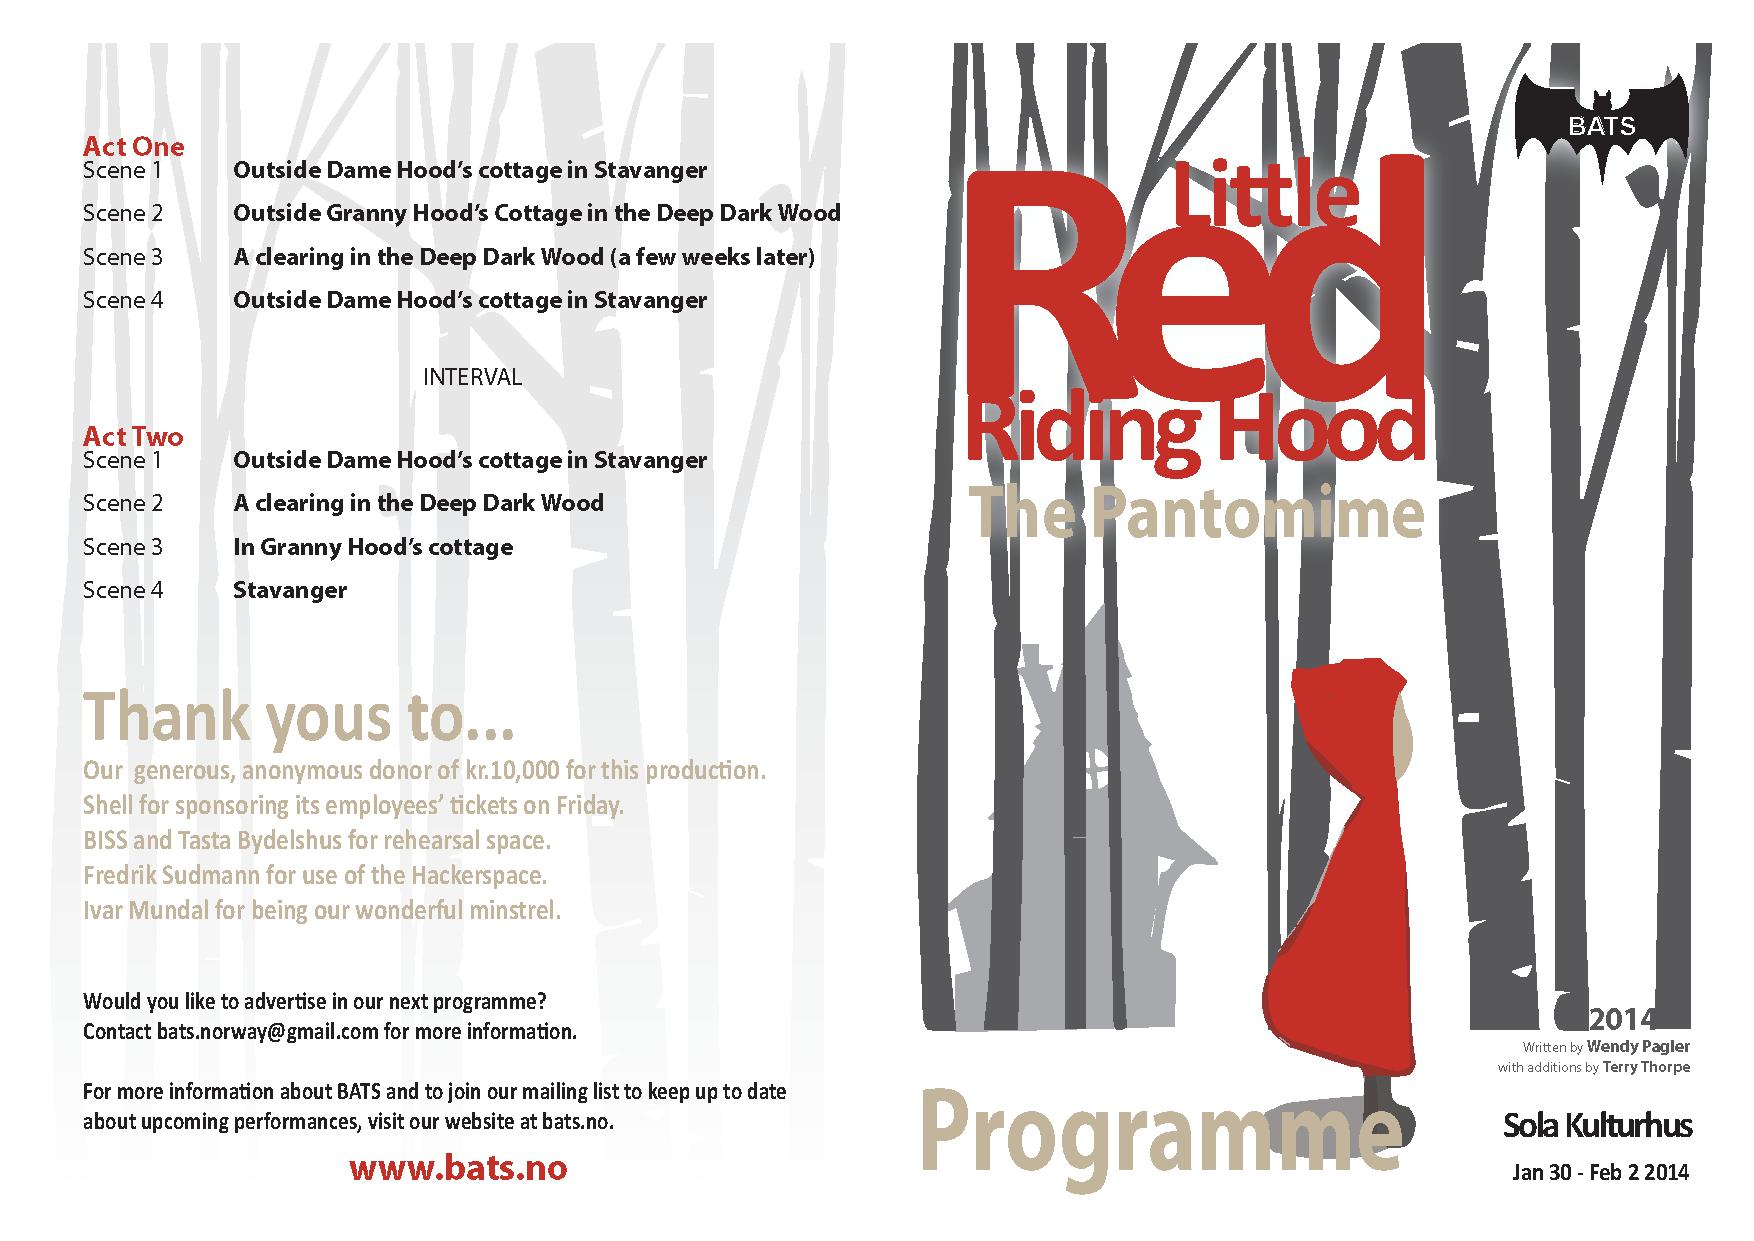 LRRH Programme